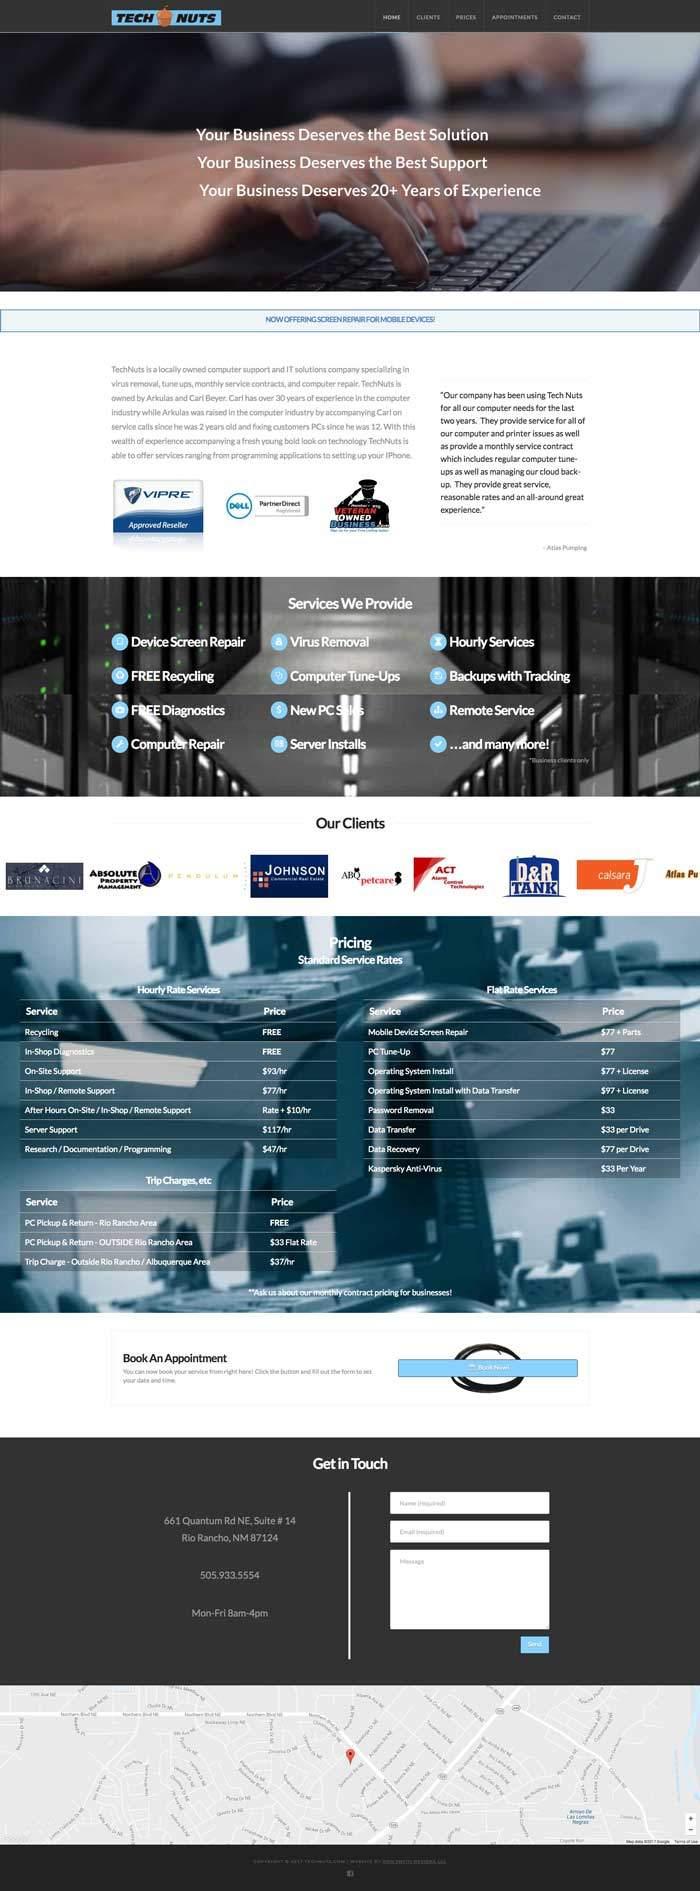 Full Website Screenshot for Technuts.com